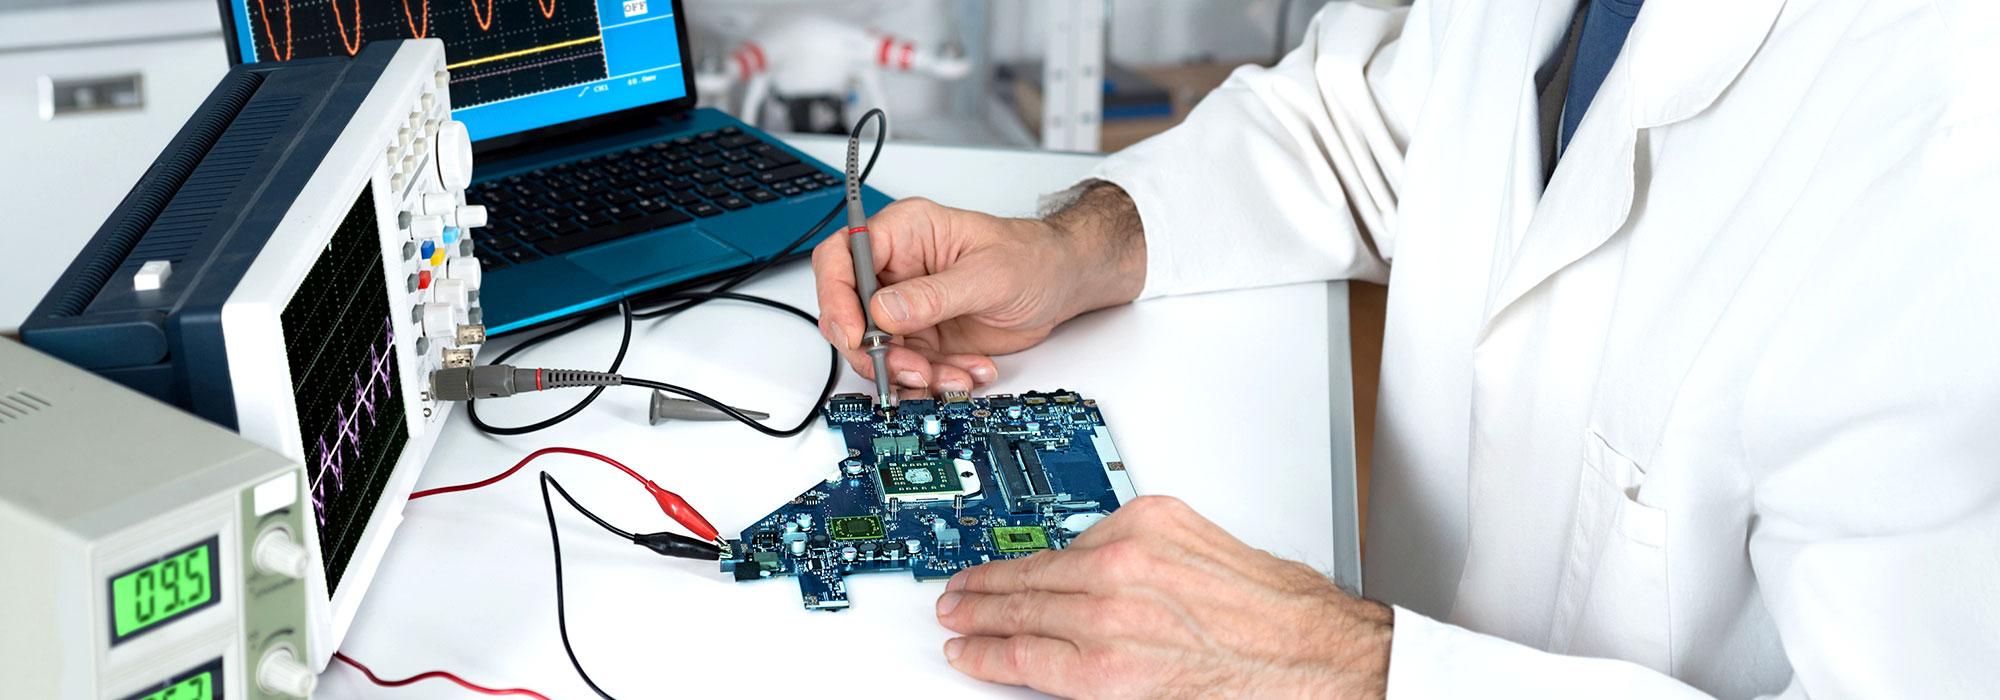 slide-4-altitek-electronic-components - Altitek Electronics inc